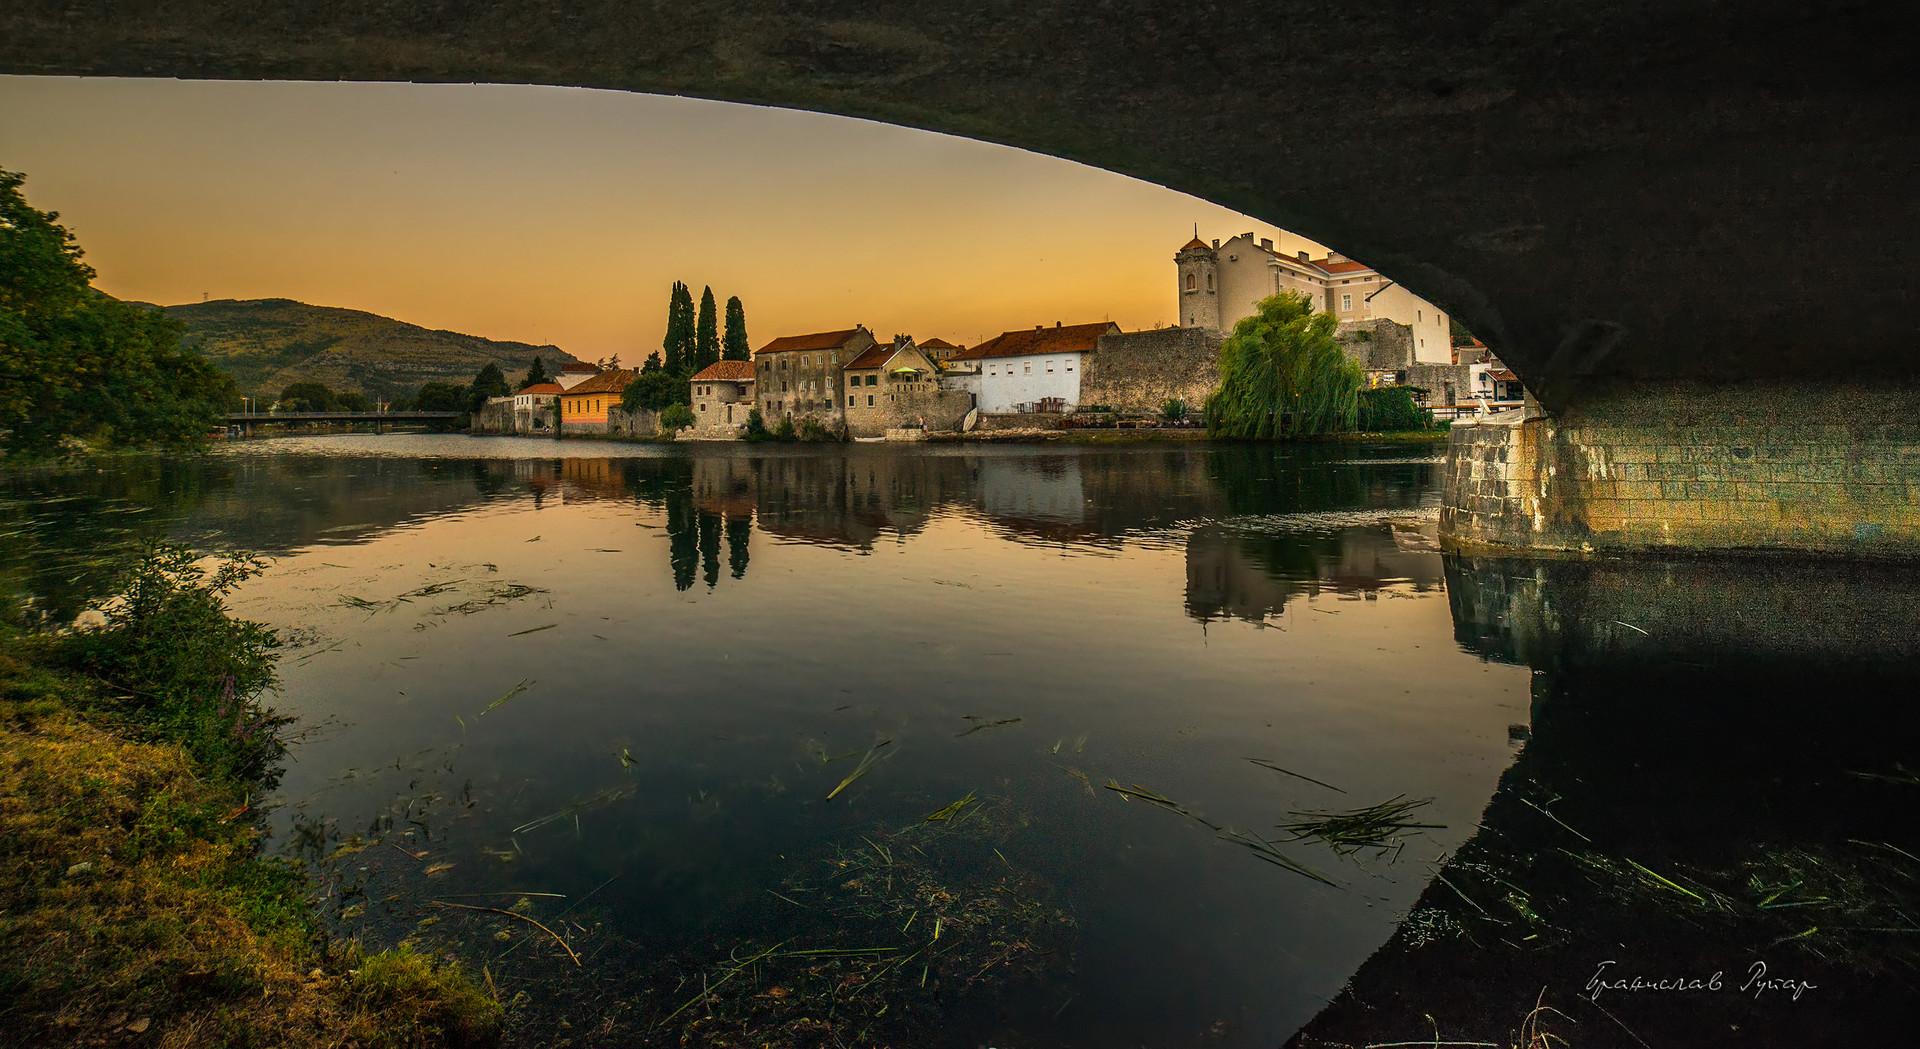 Ispod mosta